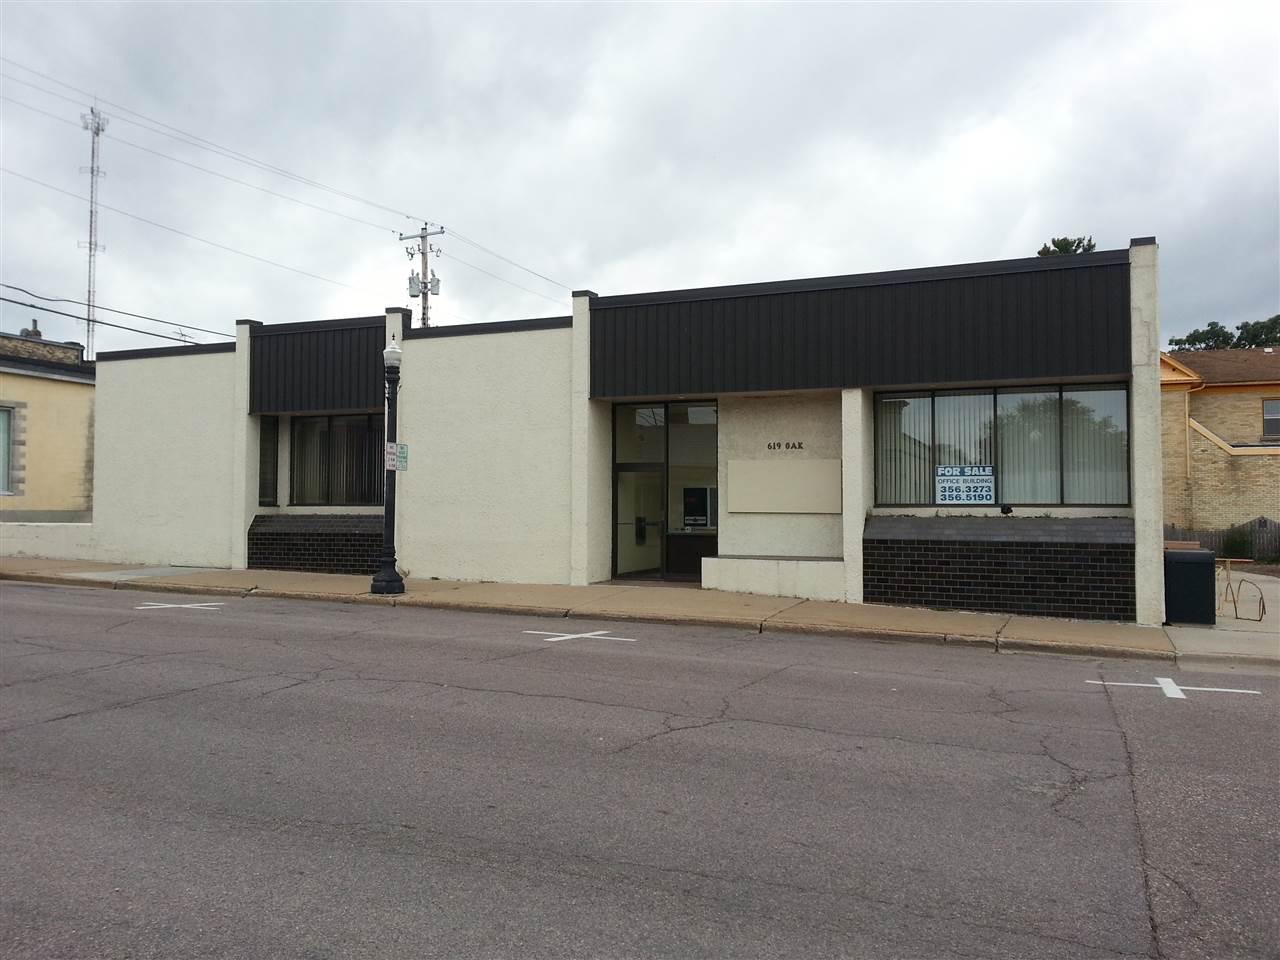 619 Oak St, Baraboo WI 53913 - Photo 1